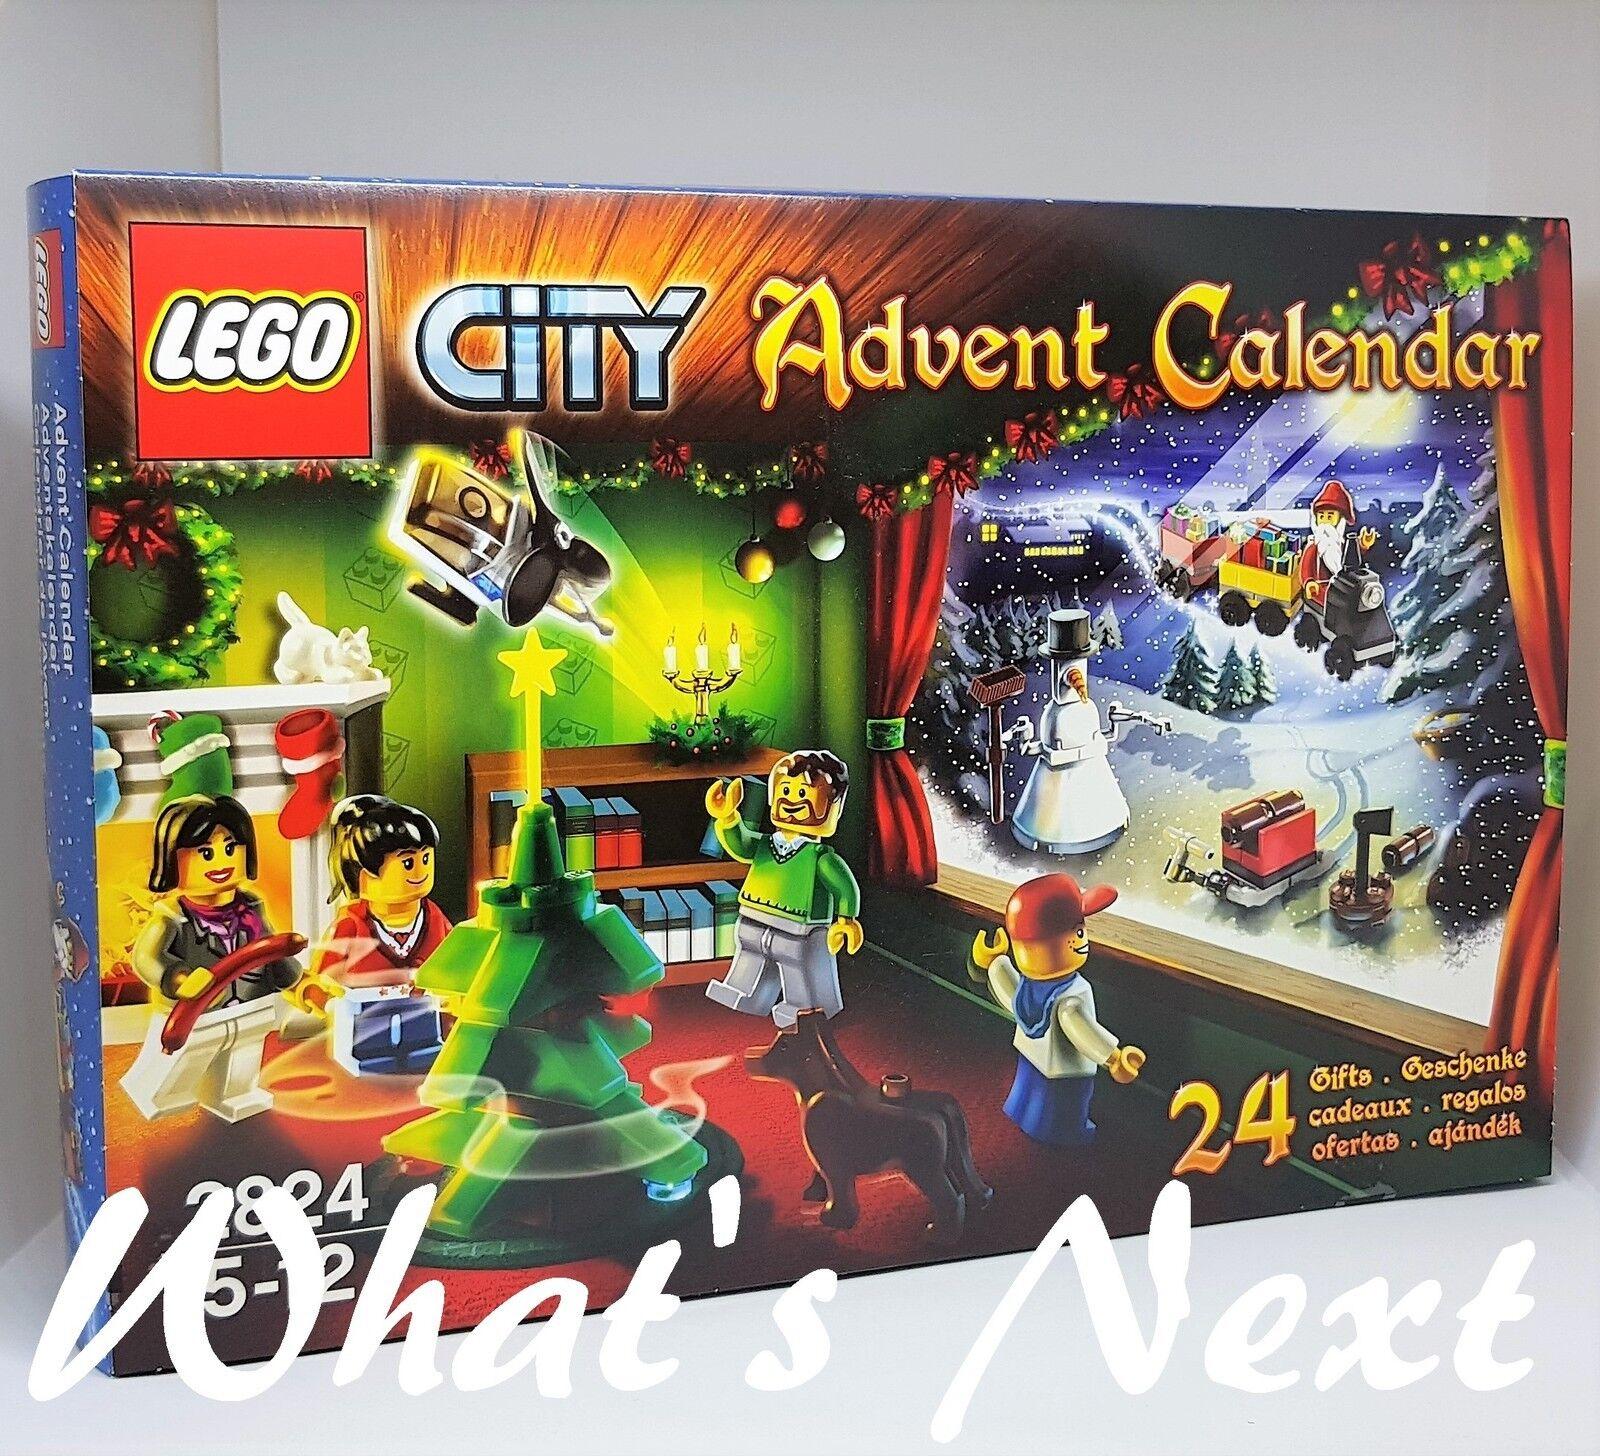 LEGO città 2010 Advent Calendar   2824  nuovo (EAN 5702014602434, Item  4560742)  punto vendita